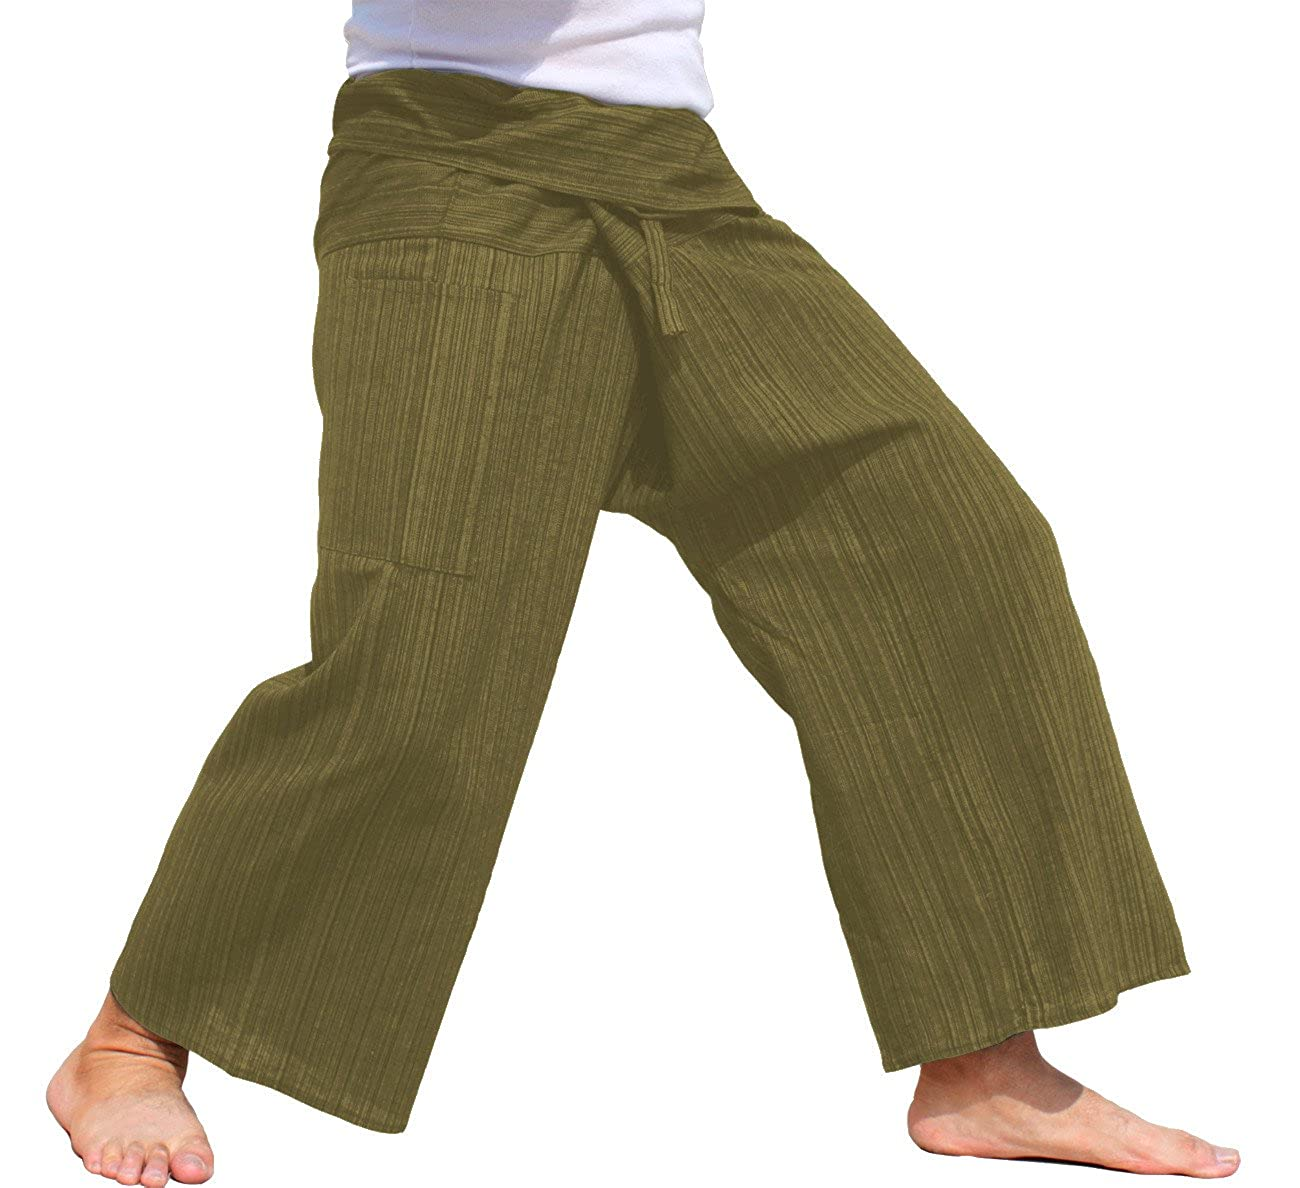 RaanPahMuang Brand Plain Thick Muang Cotton Fisherman Wrap Tall Pants CA_AMZvariant16190MDL